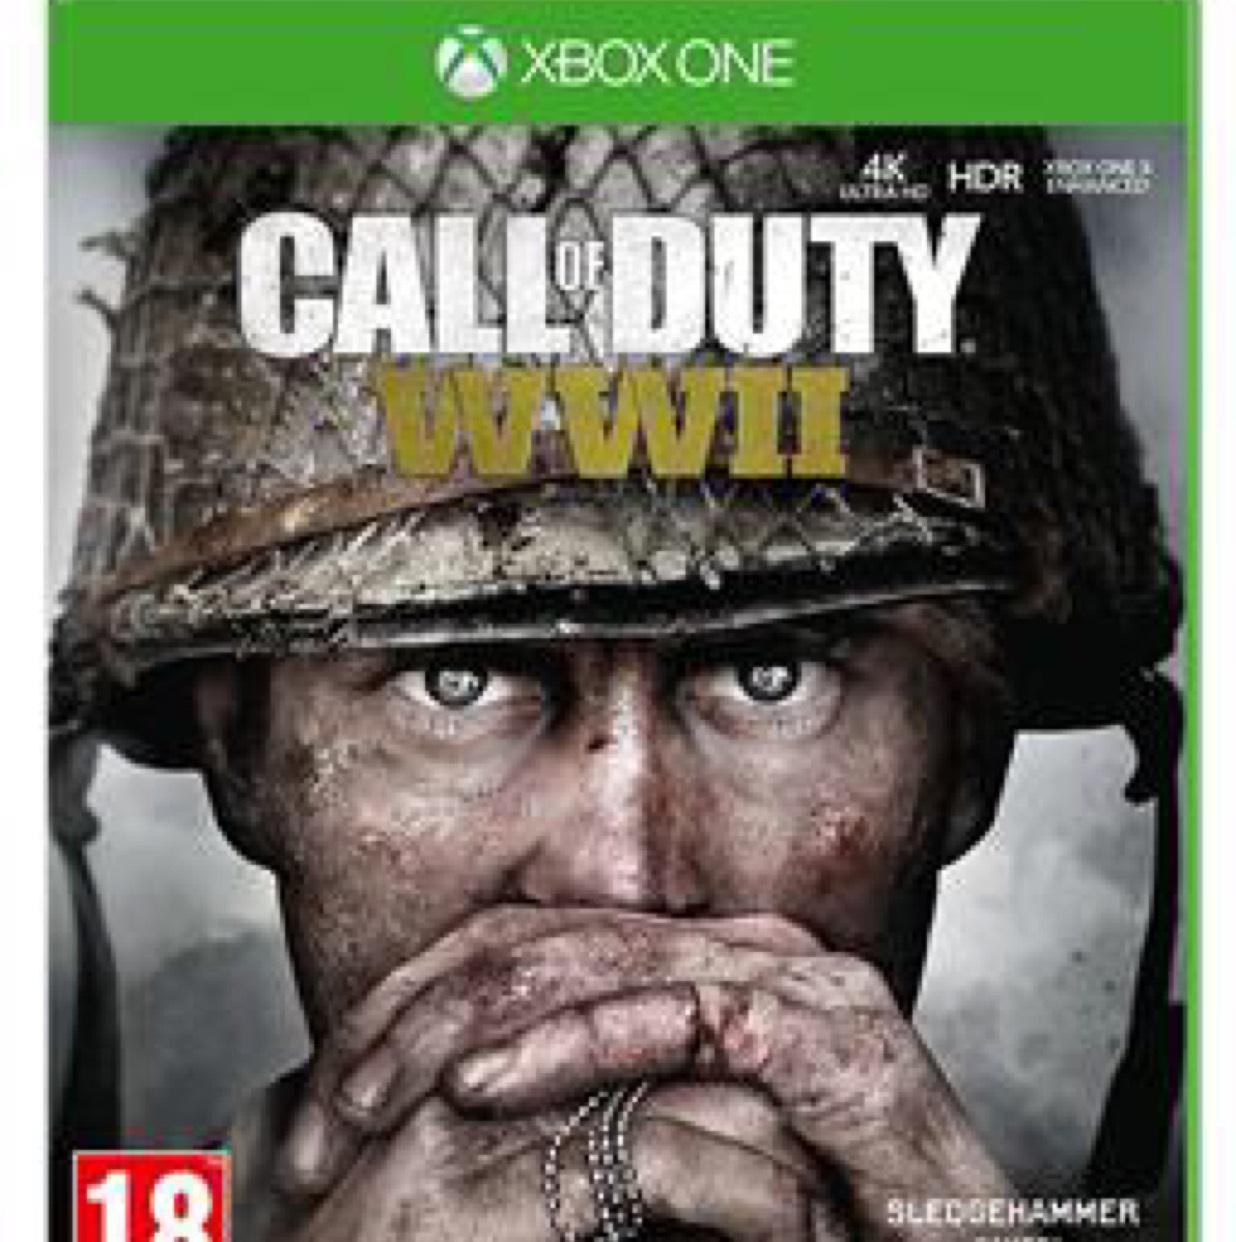 Call of duty WW2 (XB1) used £31.99 @ Grainger games